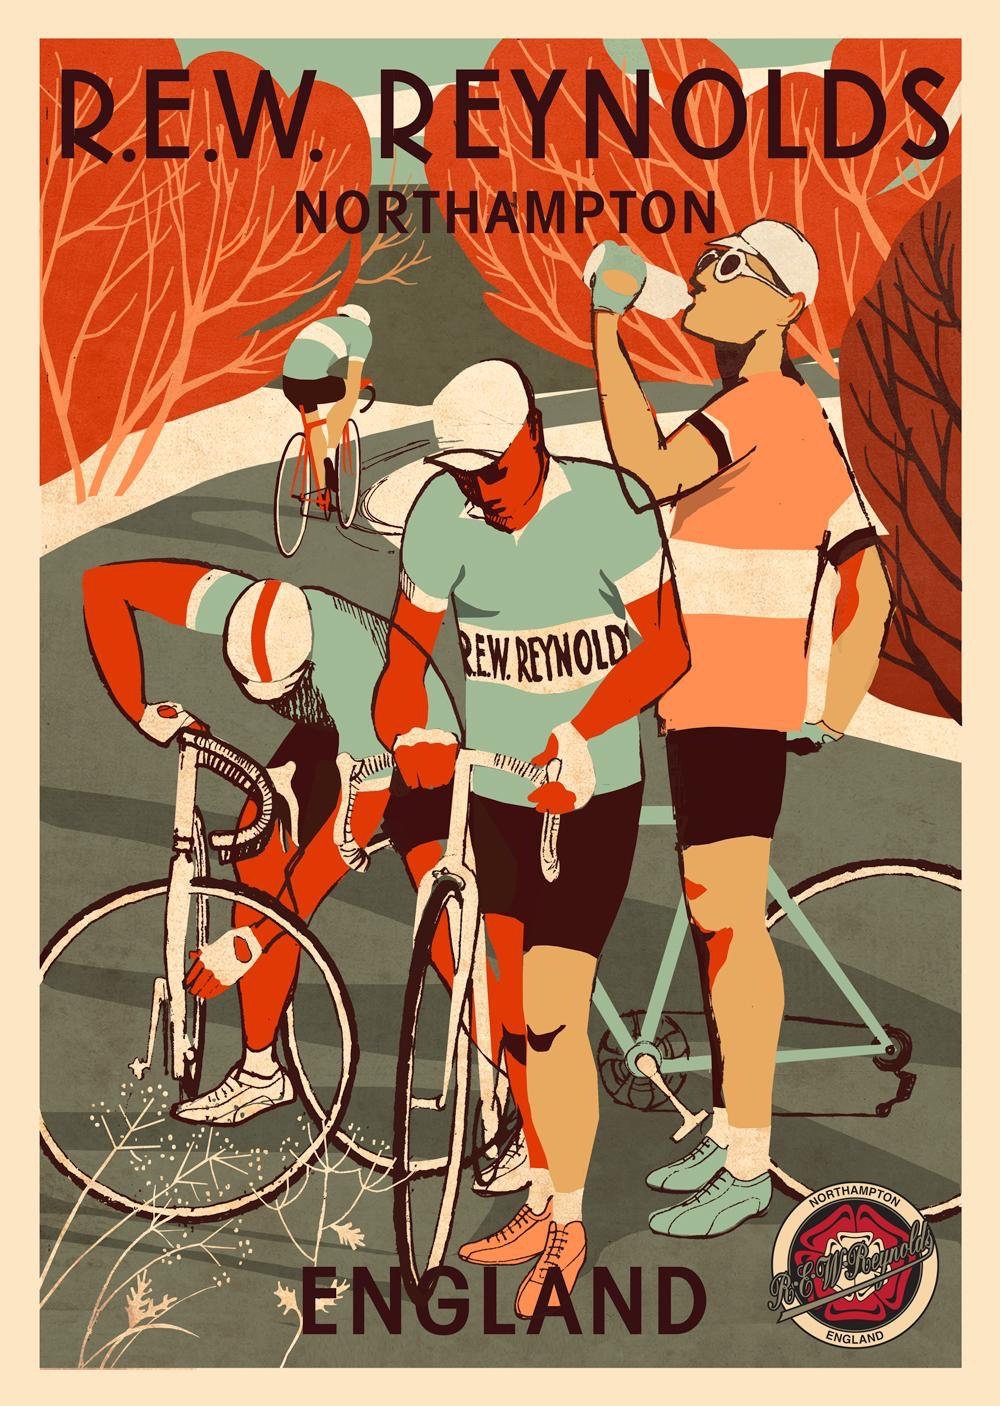 REW Reynolds poster designed by Eliza Southwood